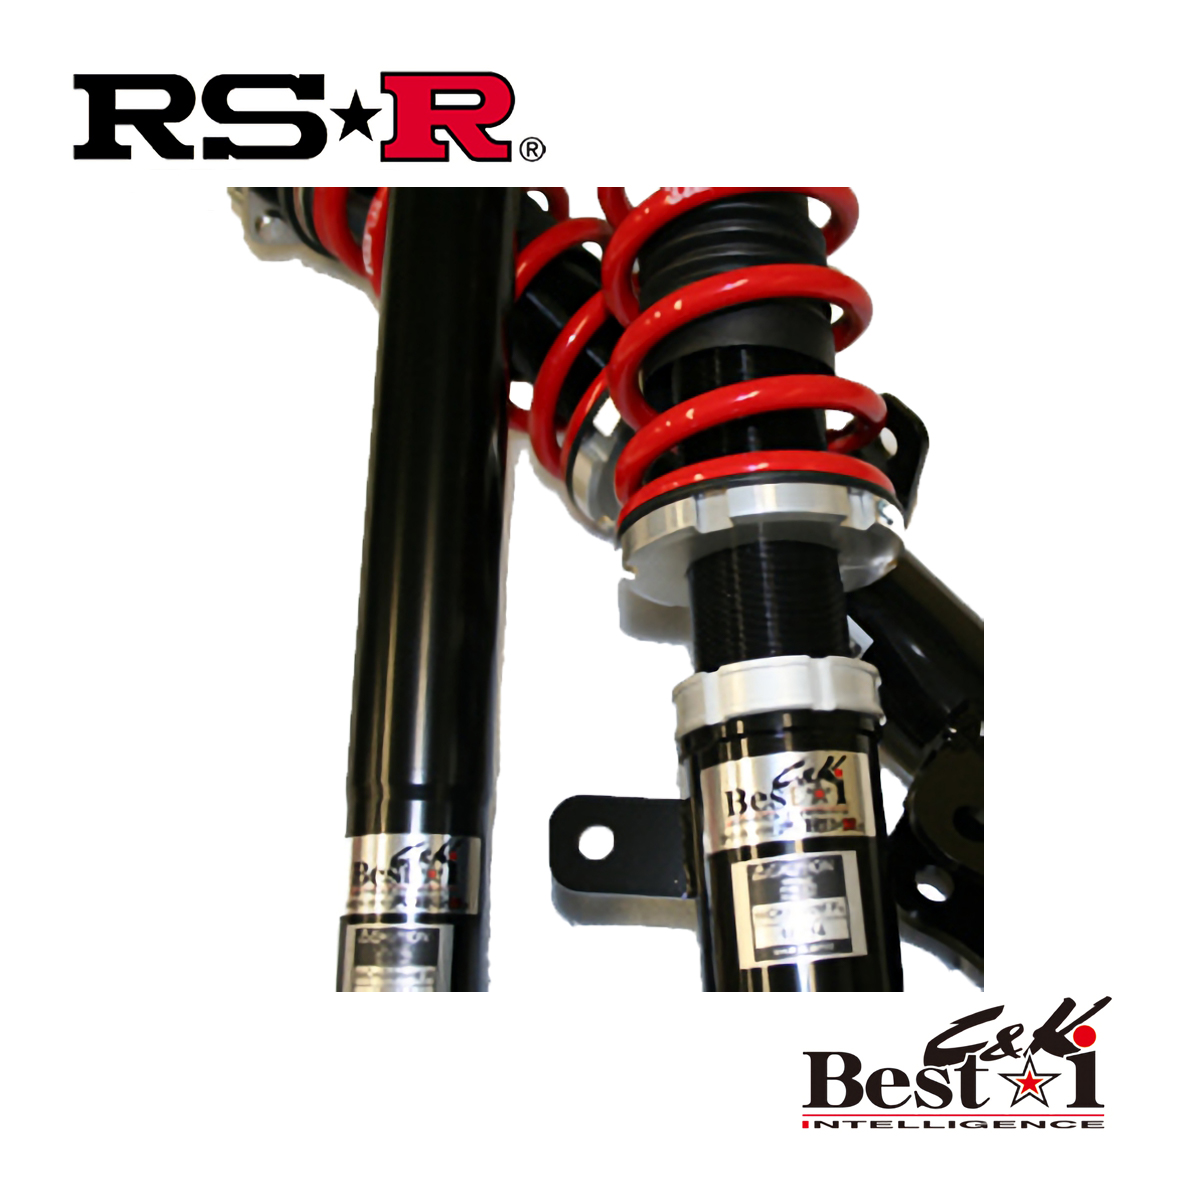 RS-R エブリィ エブリイ エブリー ワゴン DA17W JPターボ ハイルーフ 車高調 リア車高調整: ネジ式 BICKS651M ベストi C&K RSR 個人宅発送追金有